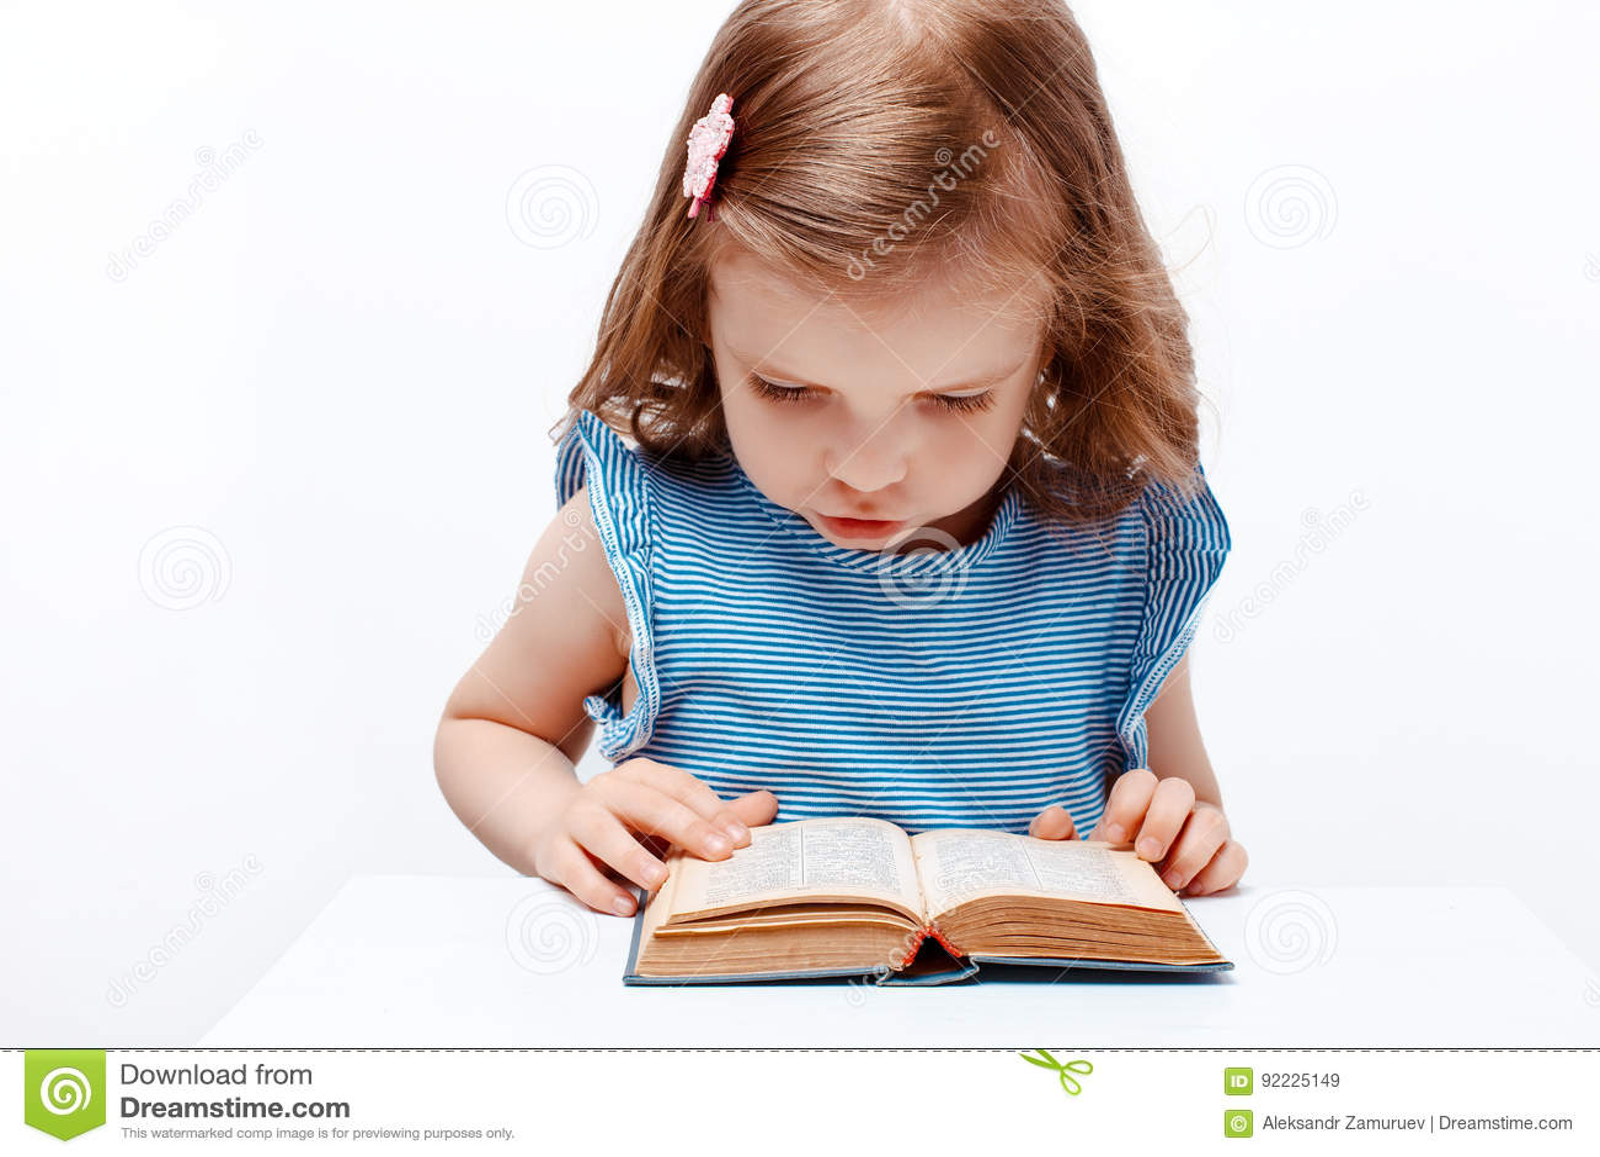 Little girl reading book. on white background